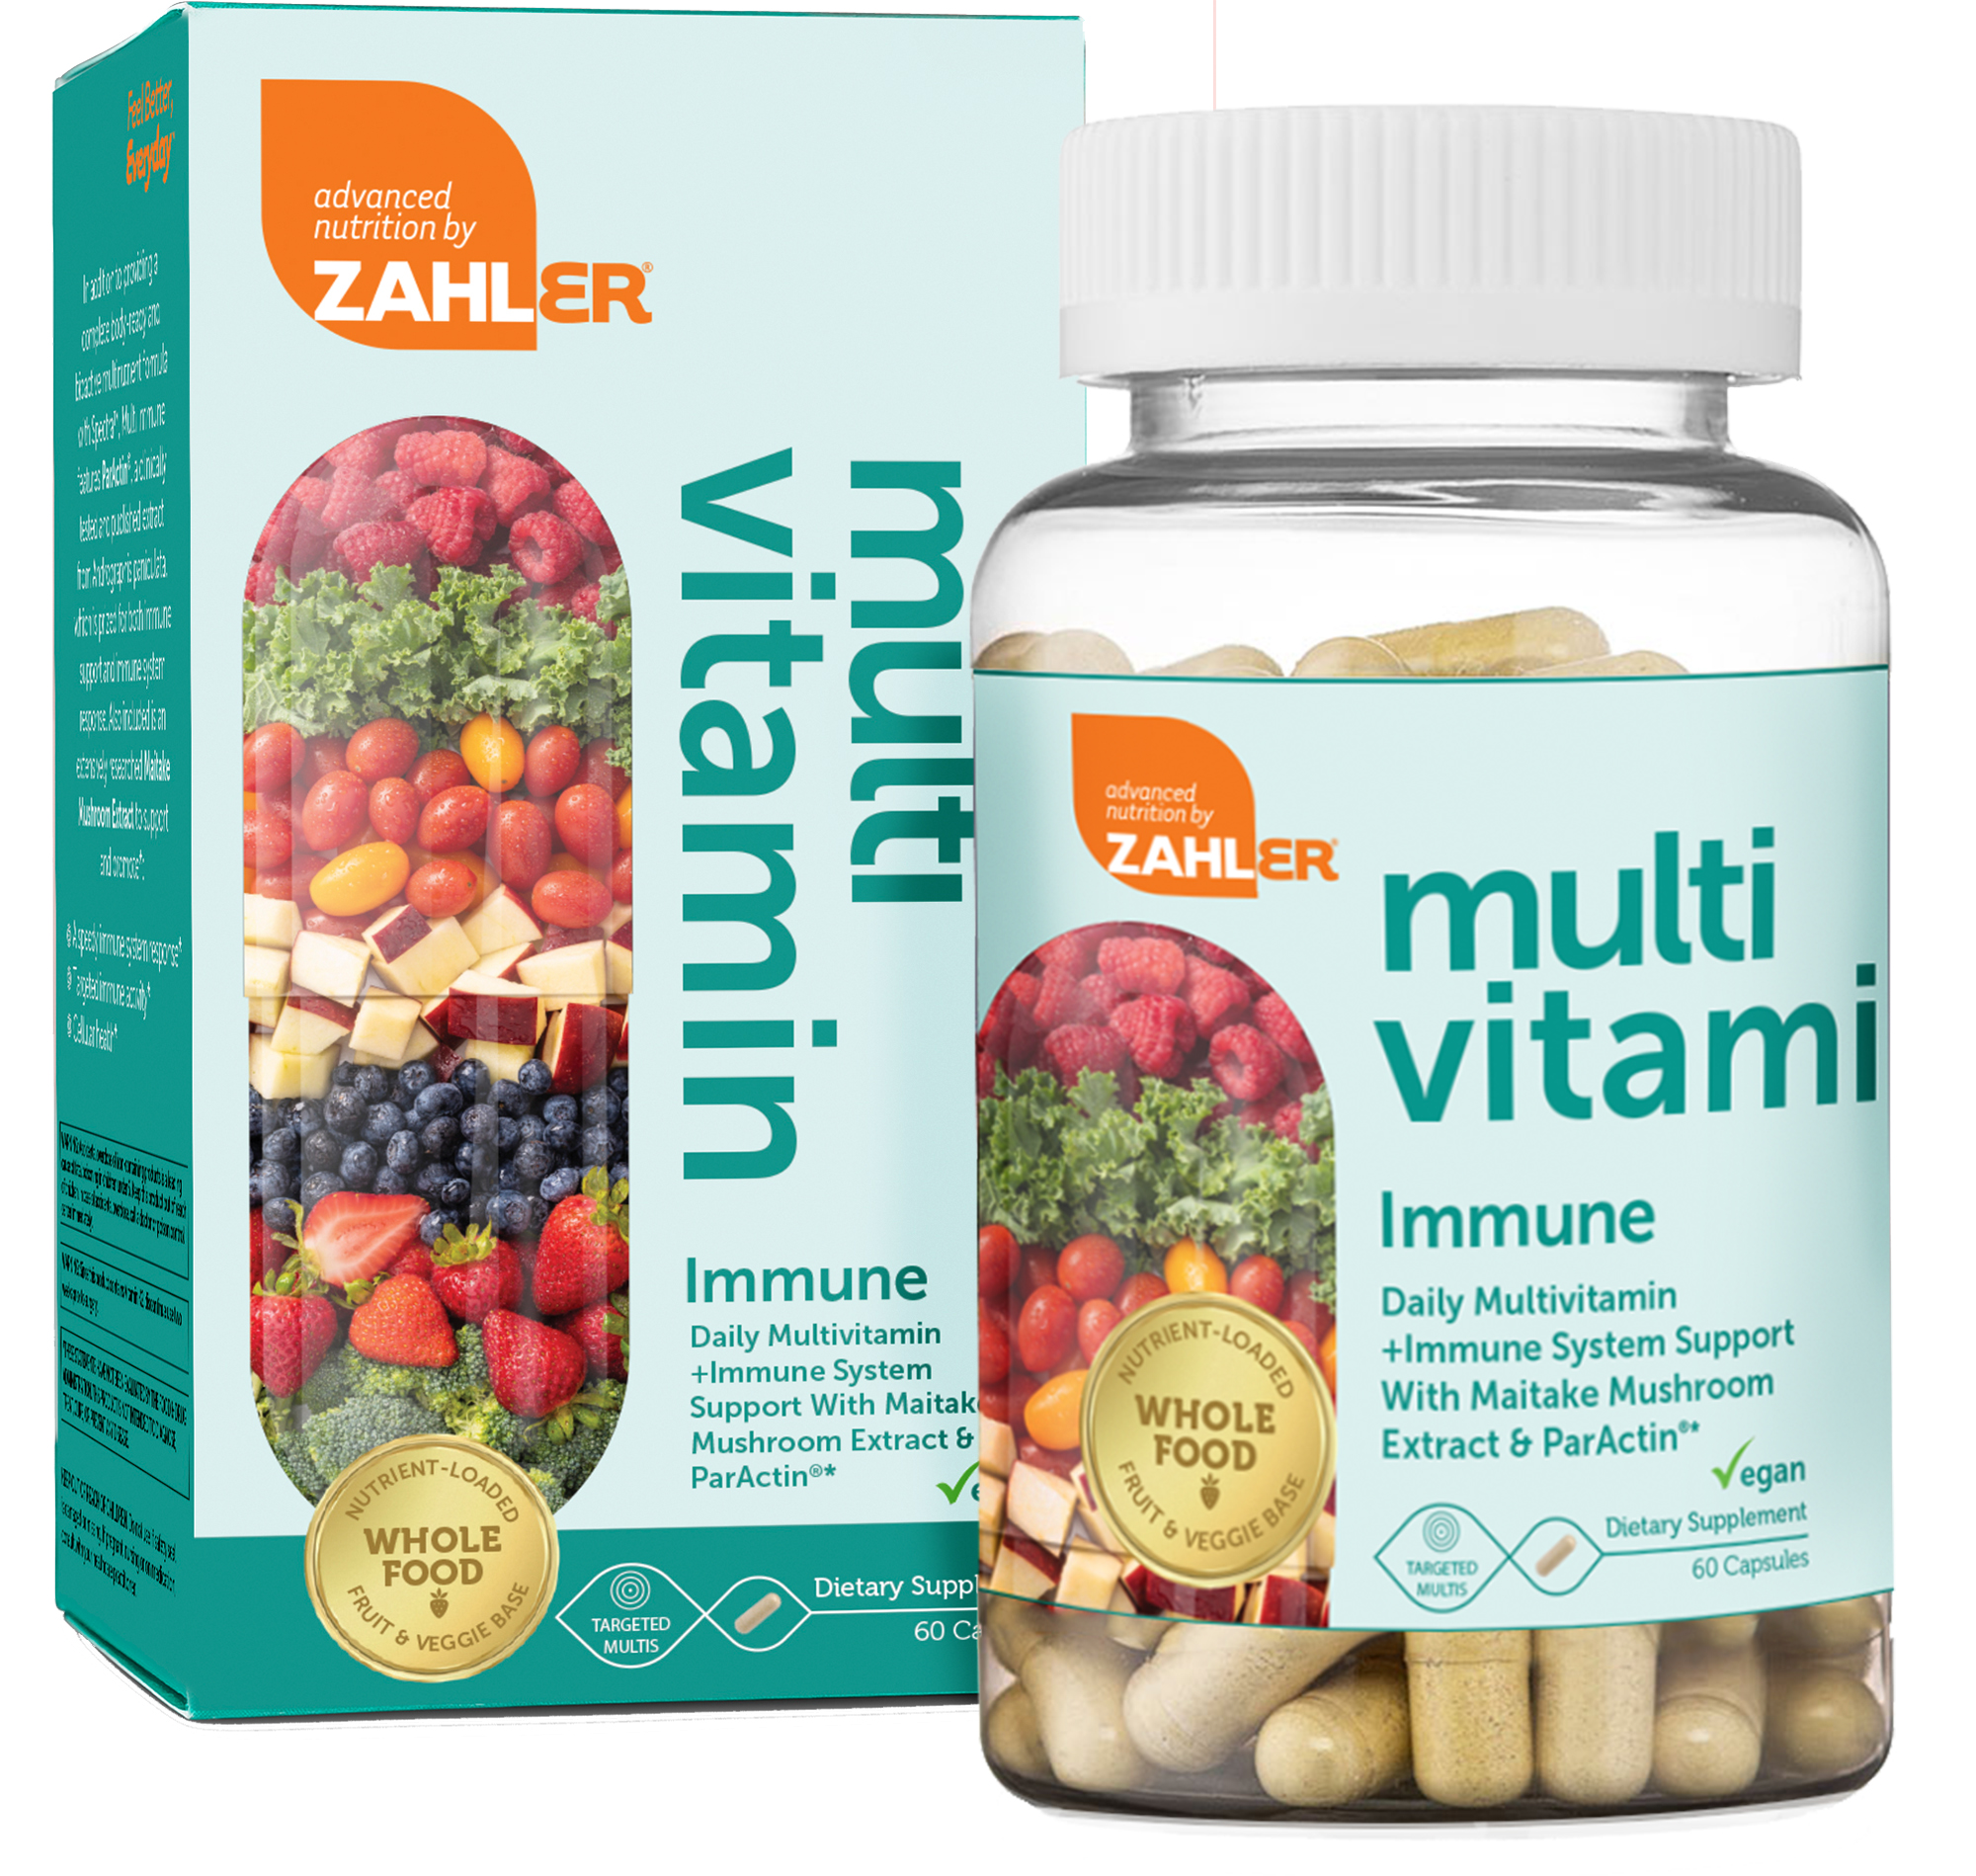 Multivitamin Immunity